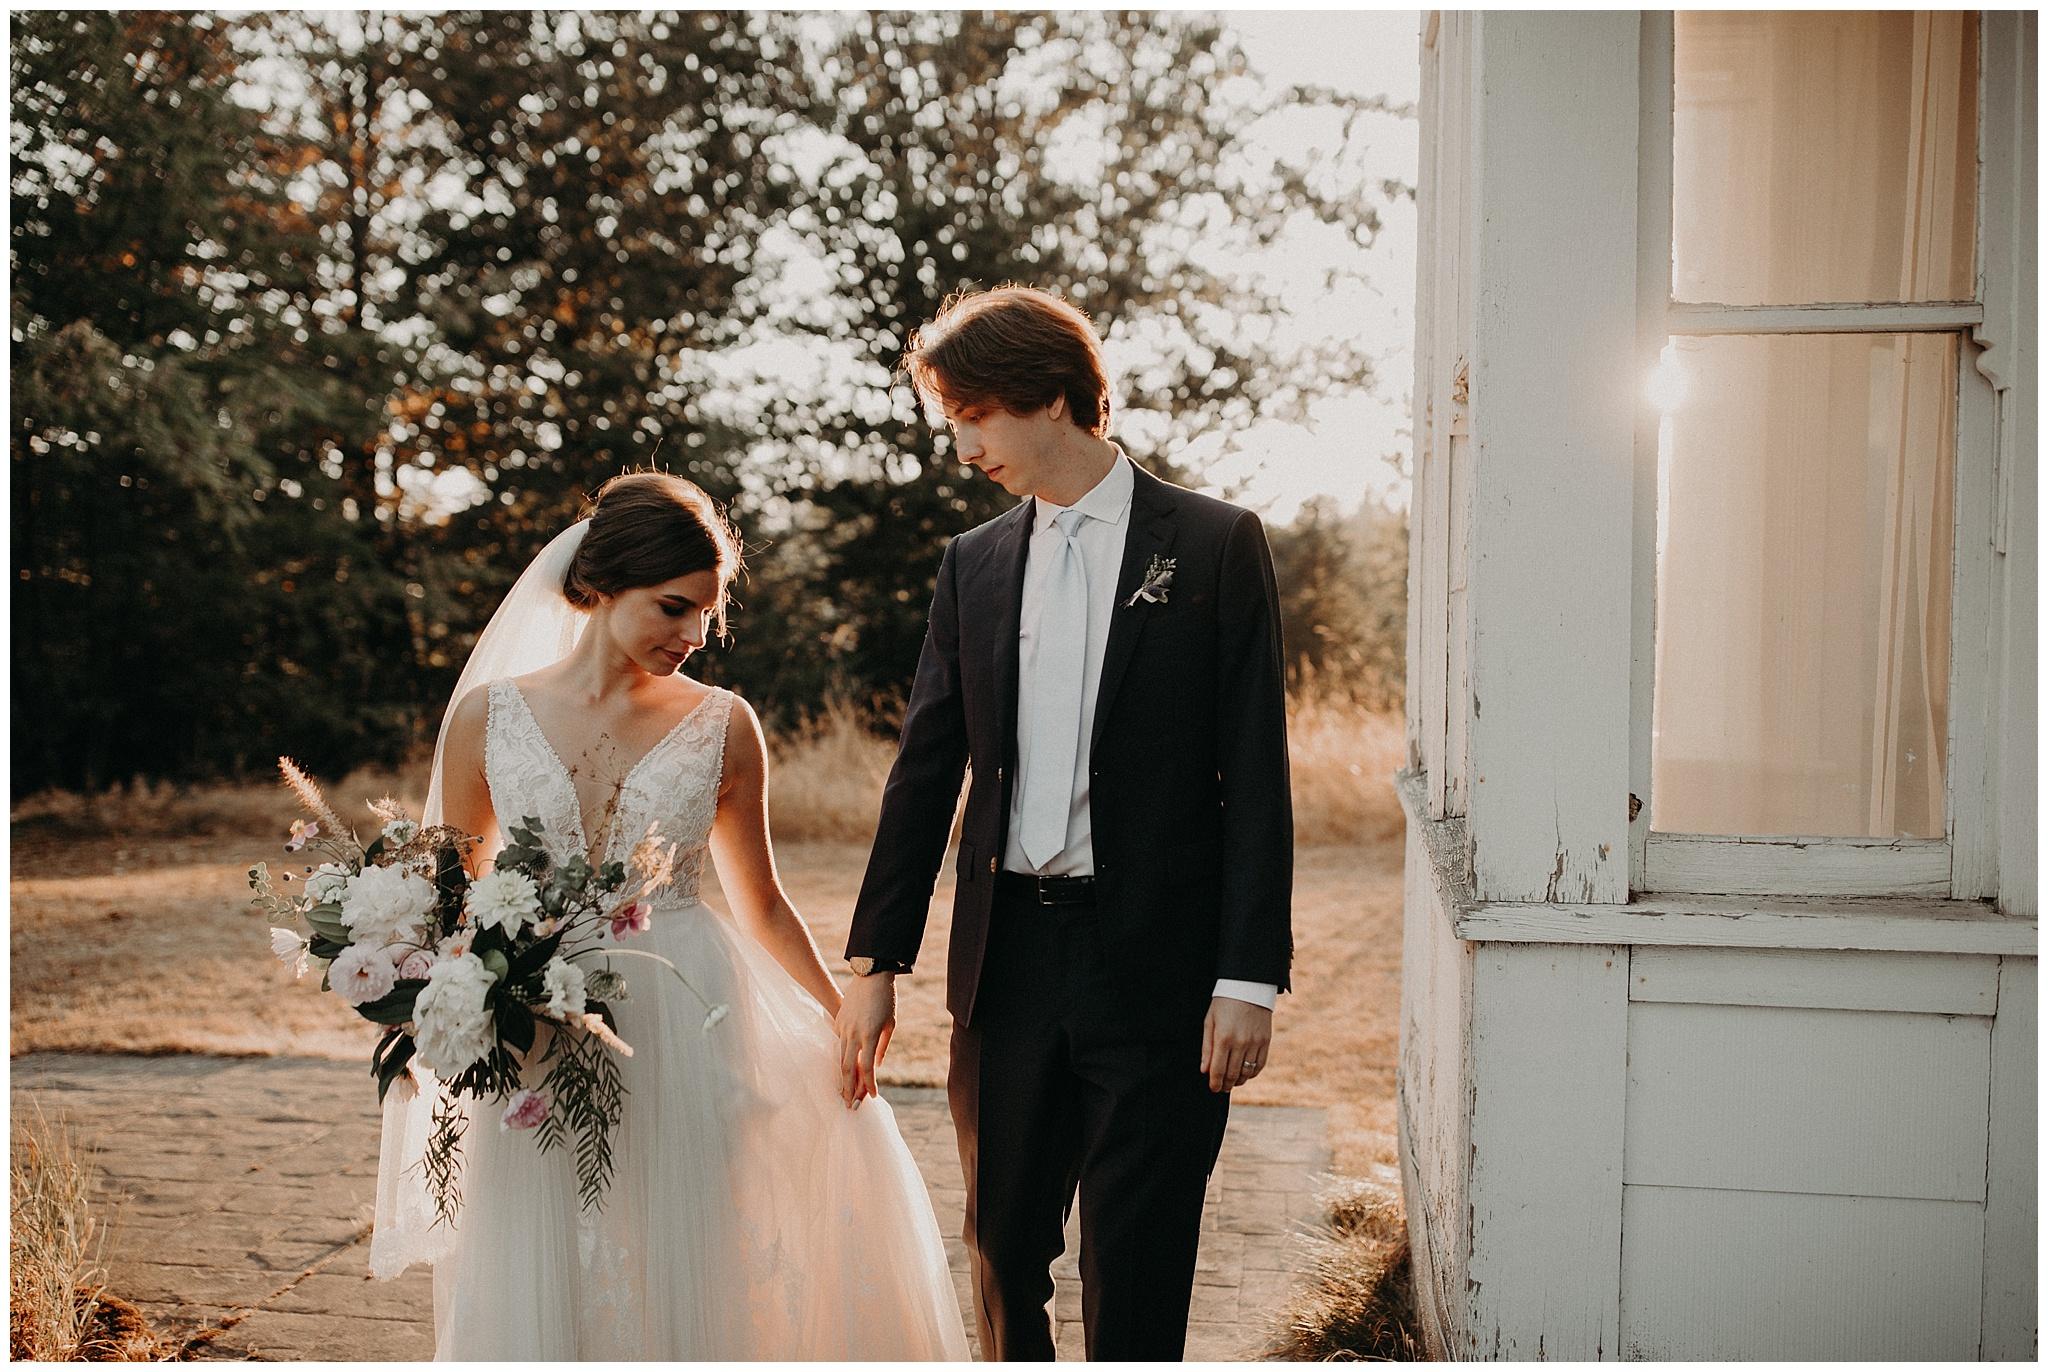 estate-248-wedding-langley-053.JPG